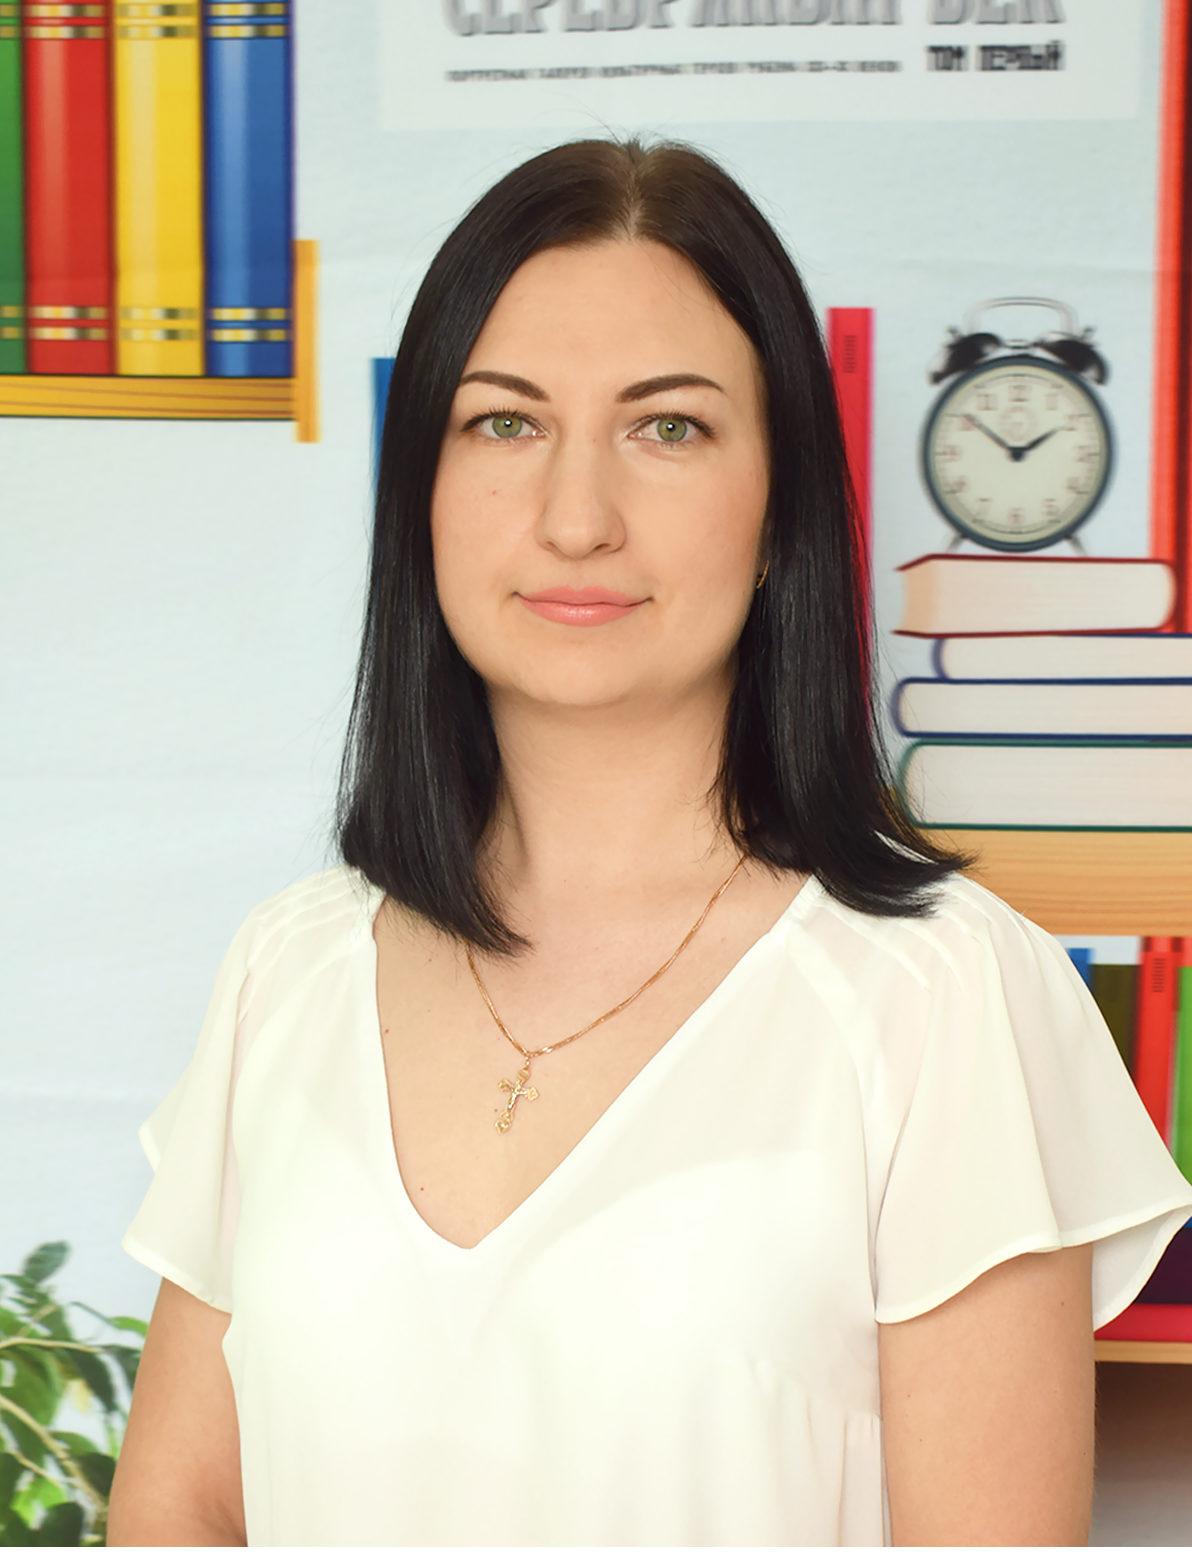 Пересада Екатерина Александровна